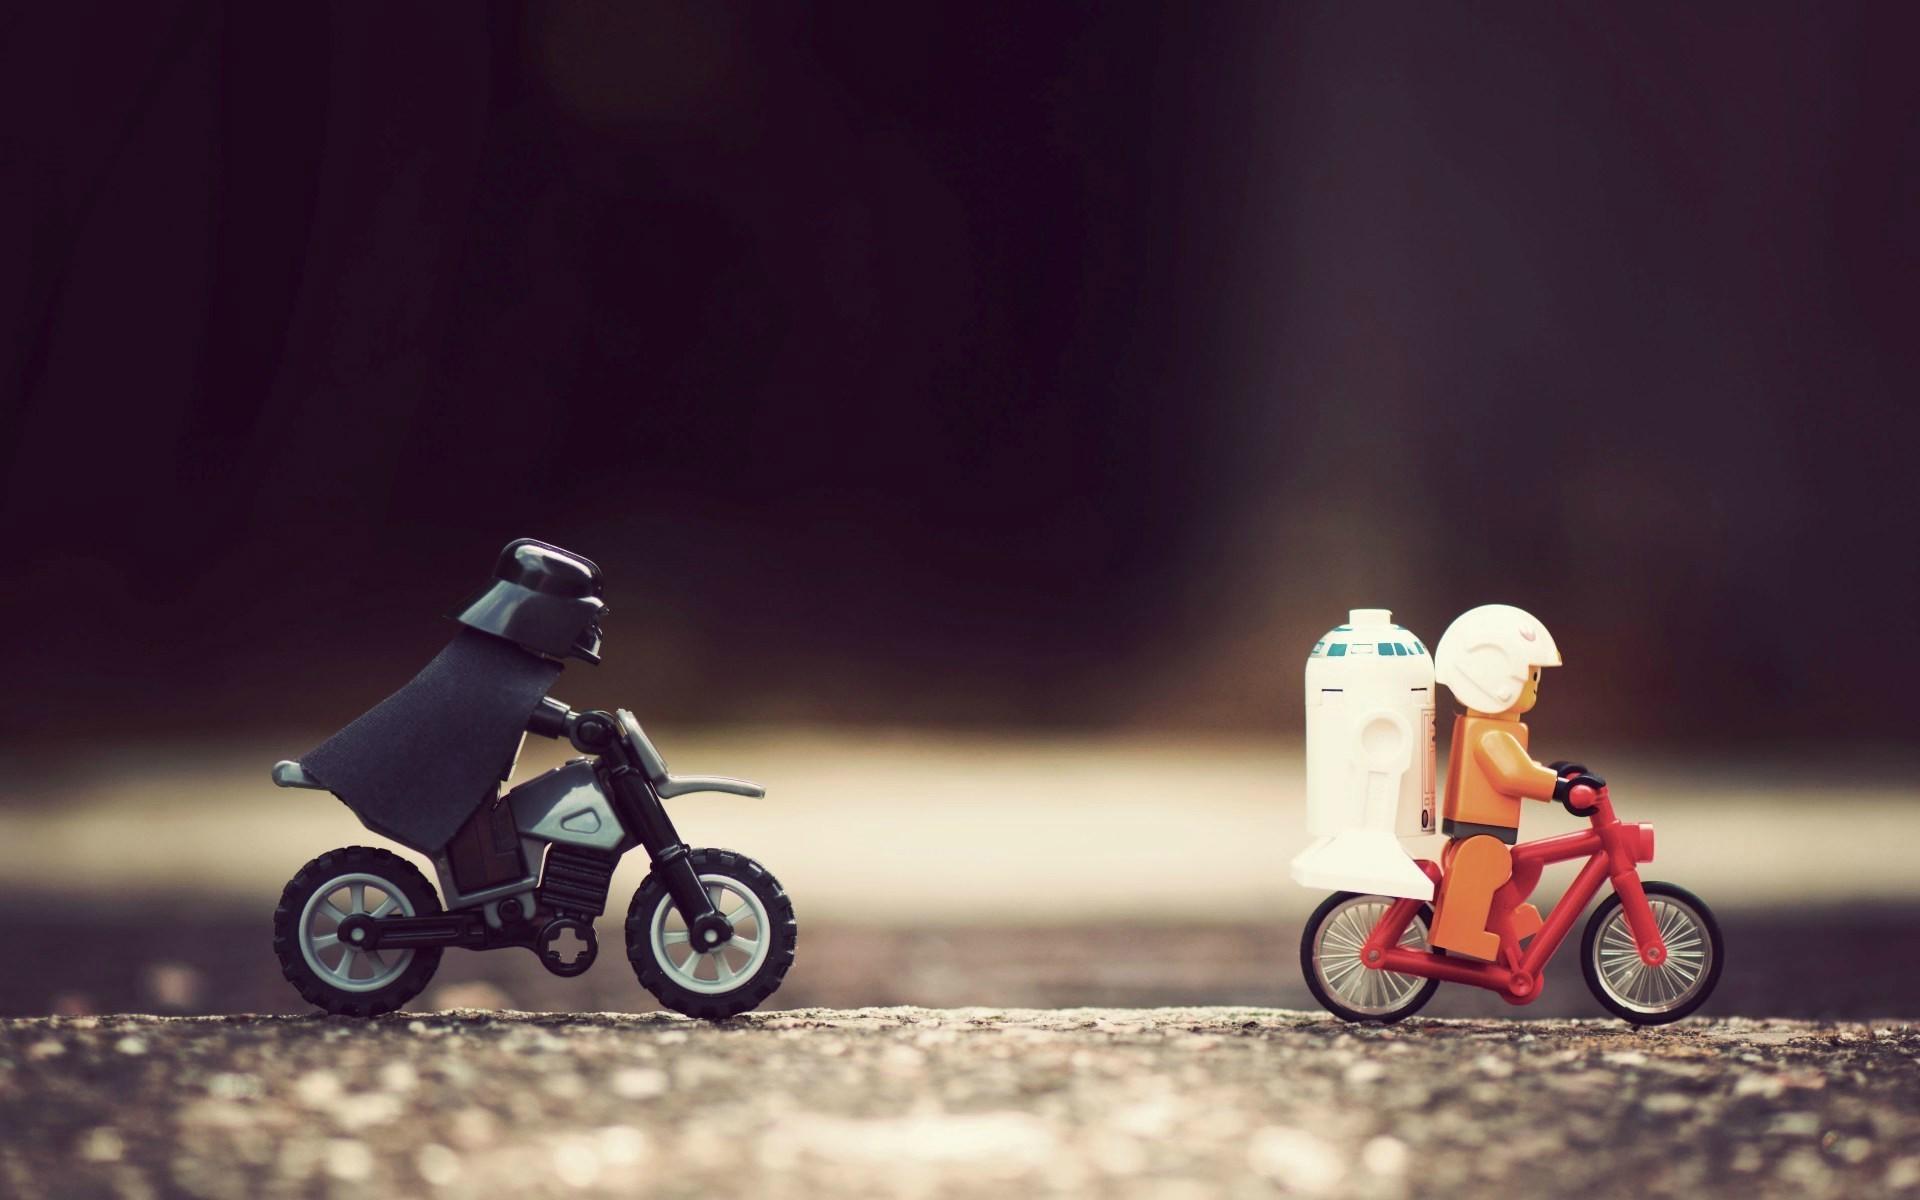 Darth Vader, Star Wars, R2 D2, LEGO, LEGO Star Wars Wallpapers HD / Desktop  and Mobile Backgrounds